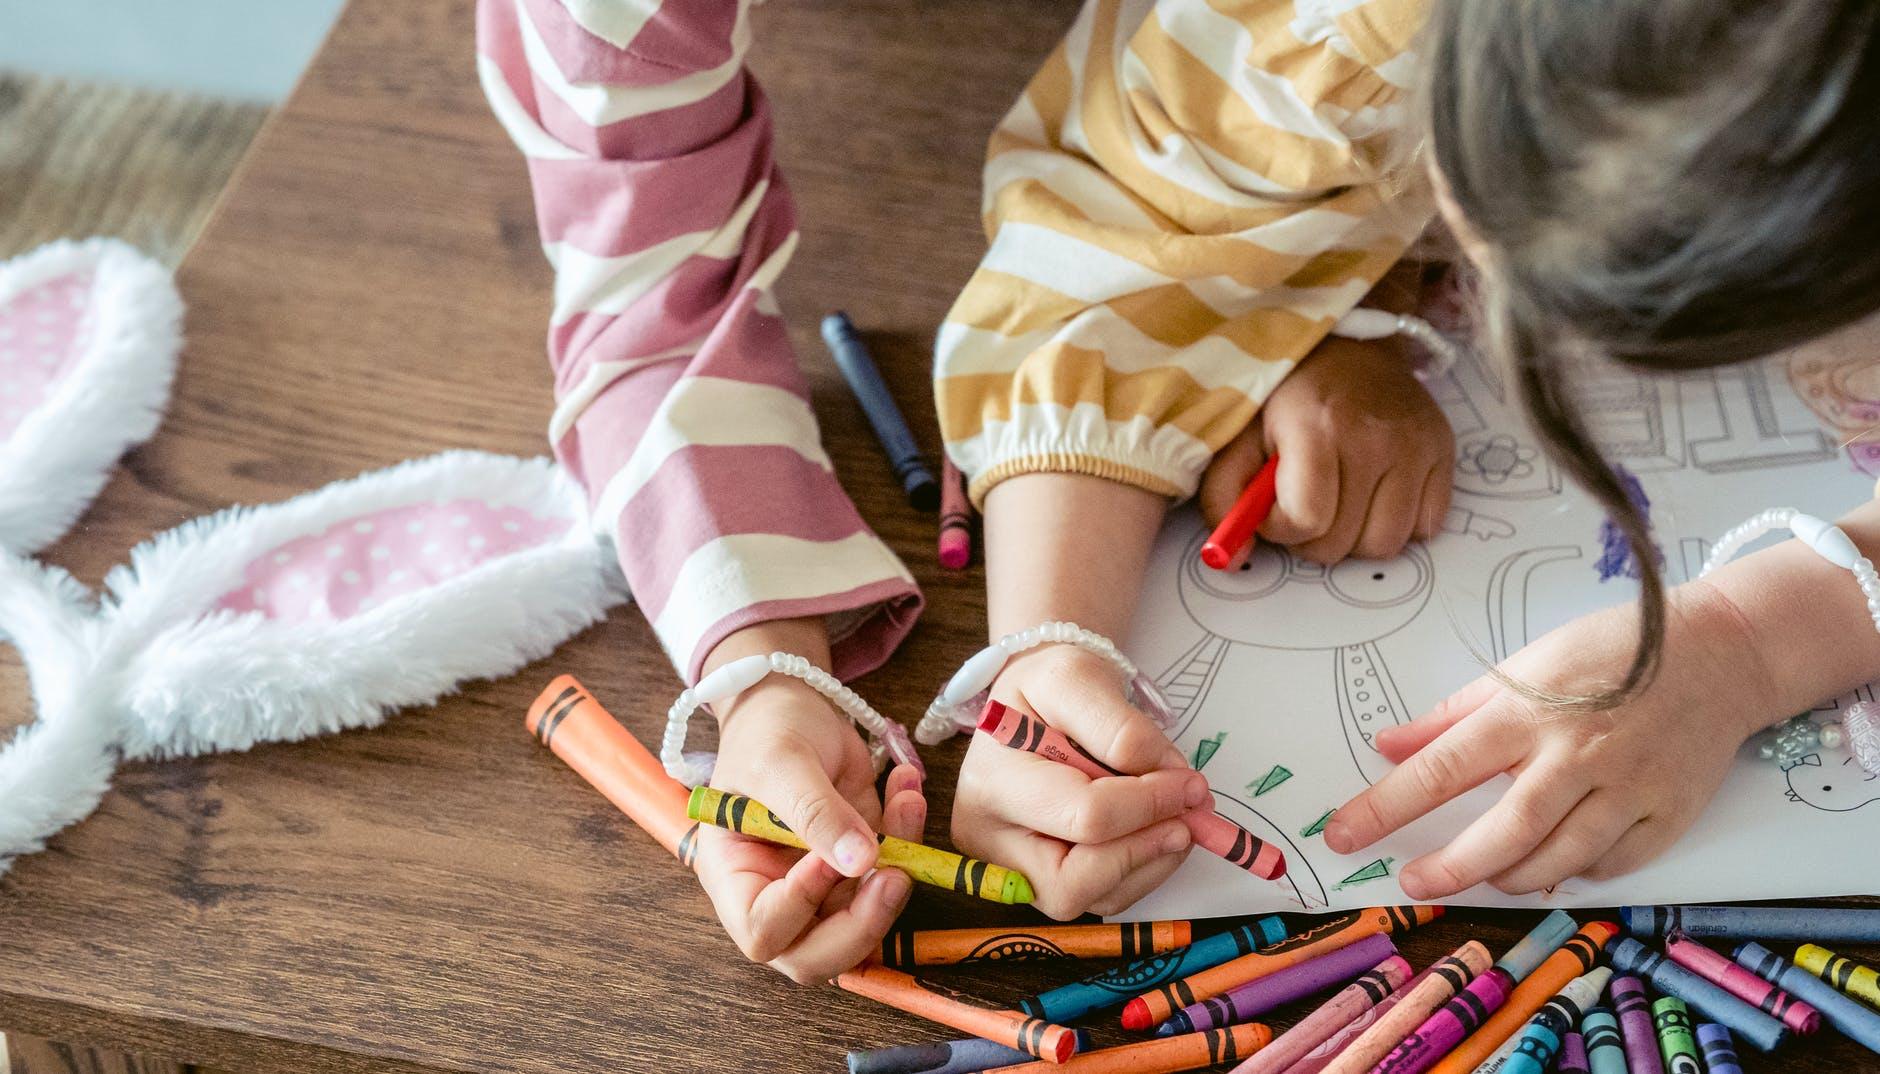 girls coloring sun on paper for easter celebration